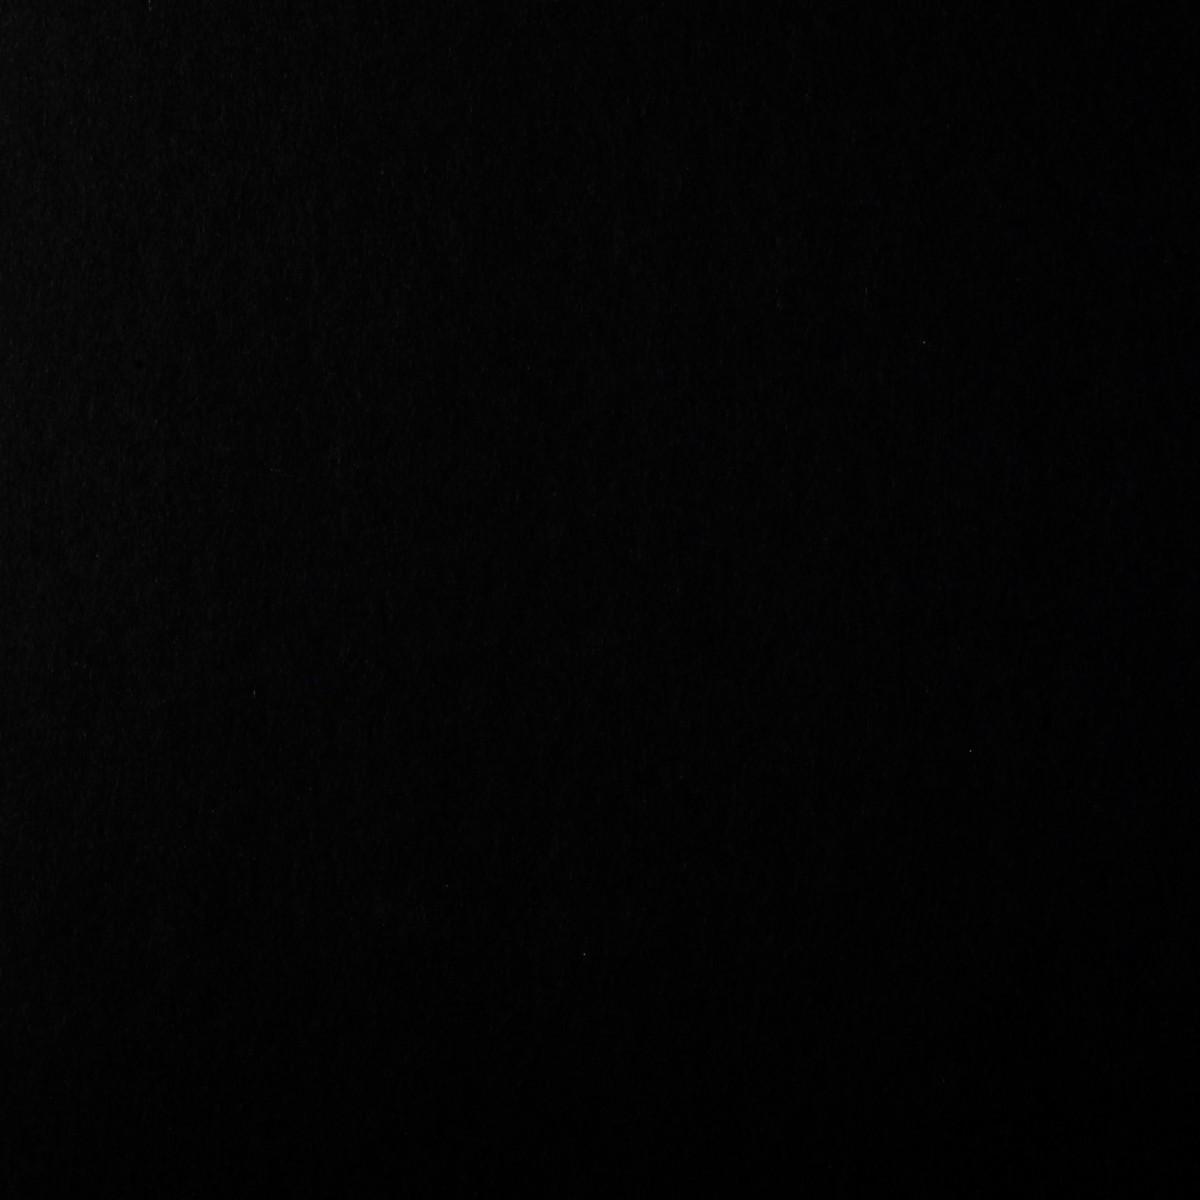 "Sirio Ultra Black 28 3/8"" x 40 1/8"" 69# Cover Sheets"